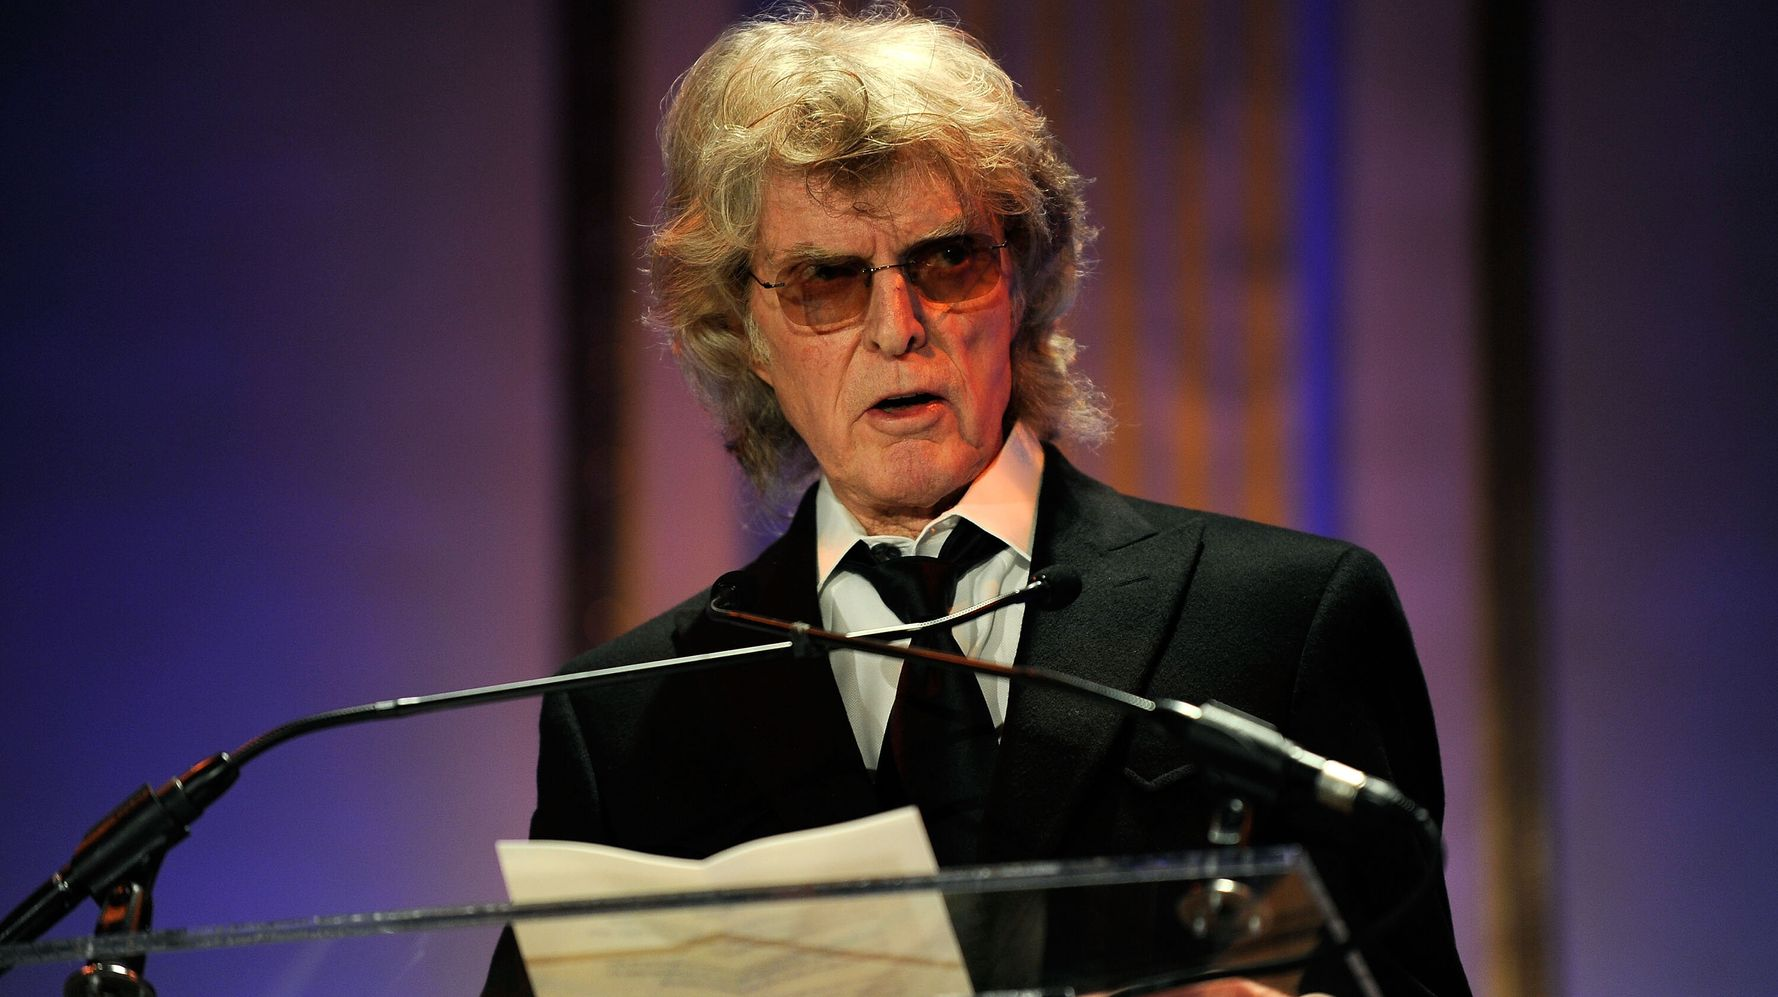 Westlake Legal Group 5e0683a2240000c31c5a46b0 Don Imus, Racist Radio Show Host, Dead At 79